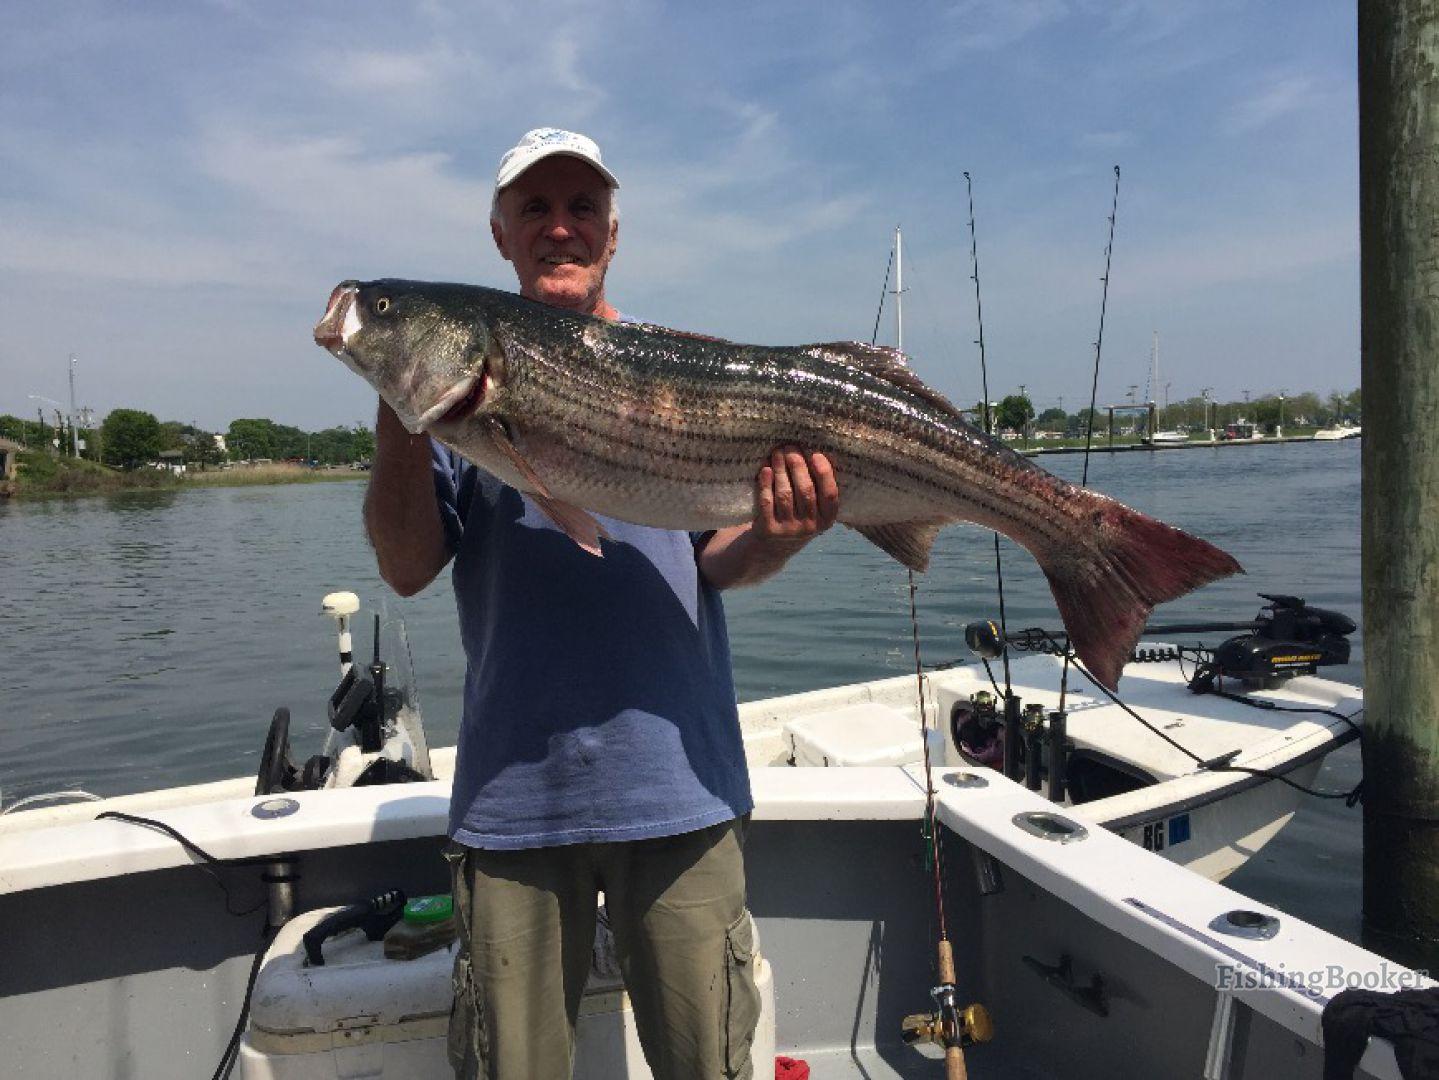 Pelagic beast fishing charters llc norwalk connecticut for Fishing charters ct